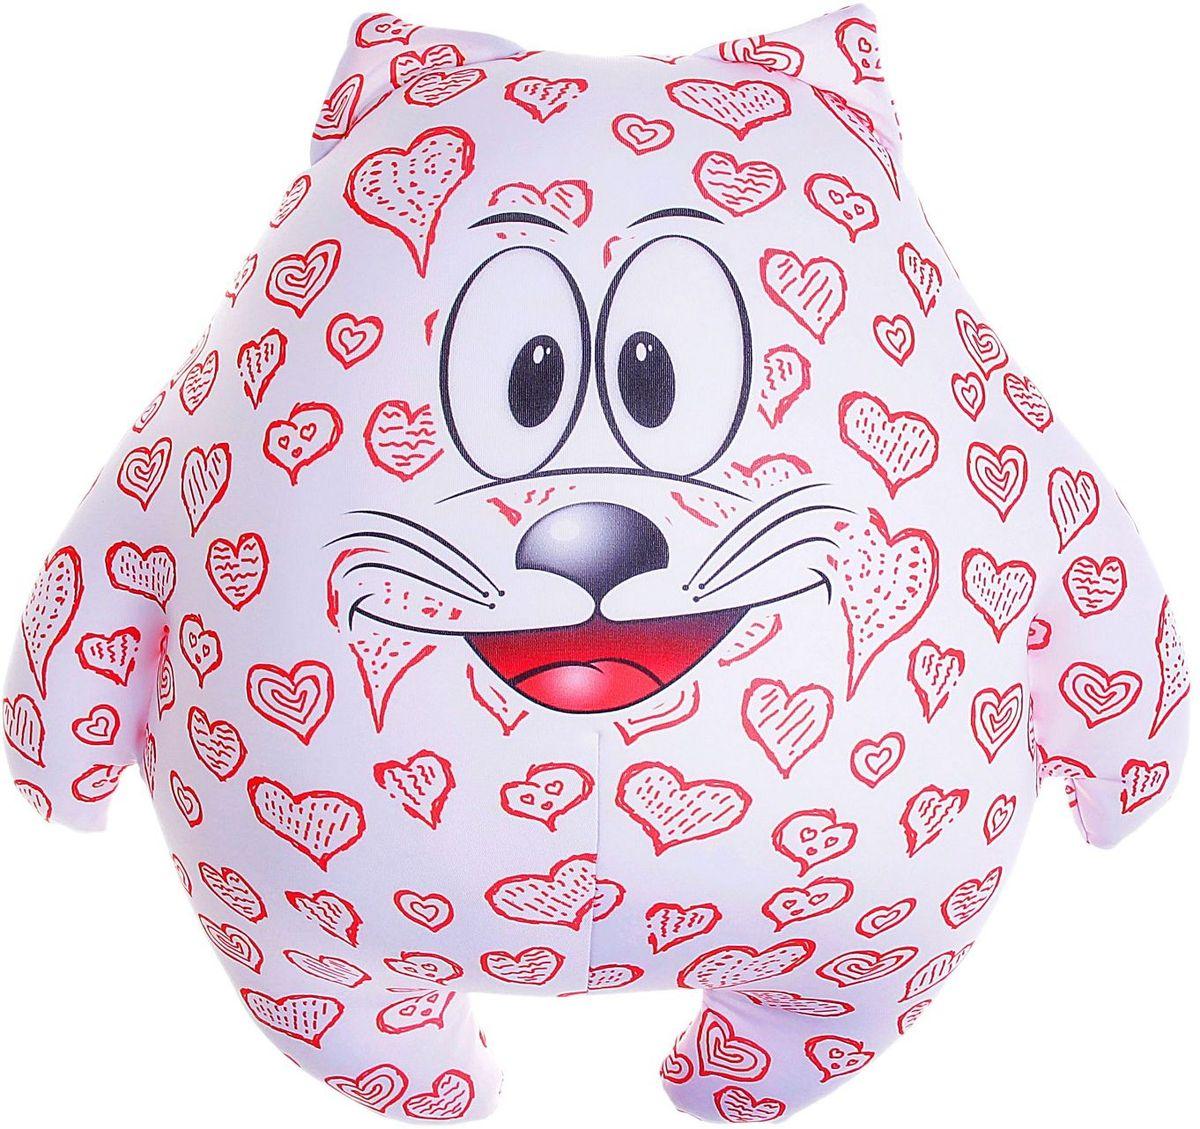 Мнушки Мягкая игрушка-антистресс Кот Лаки 39 см сувенир сувенирыч подушка игрушка антистресс кот цветочный